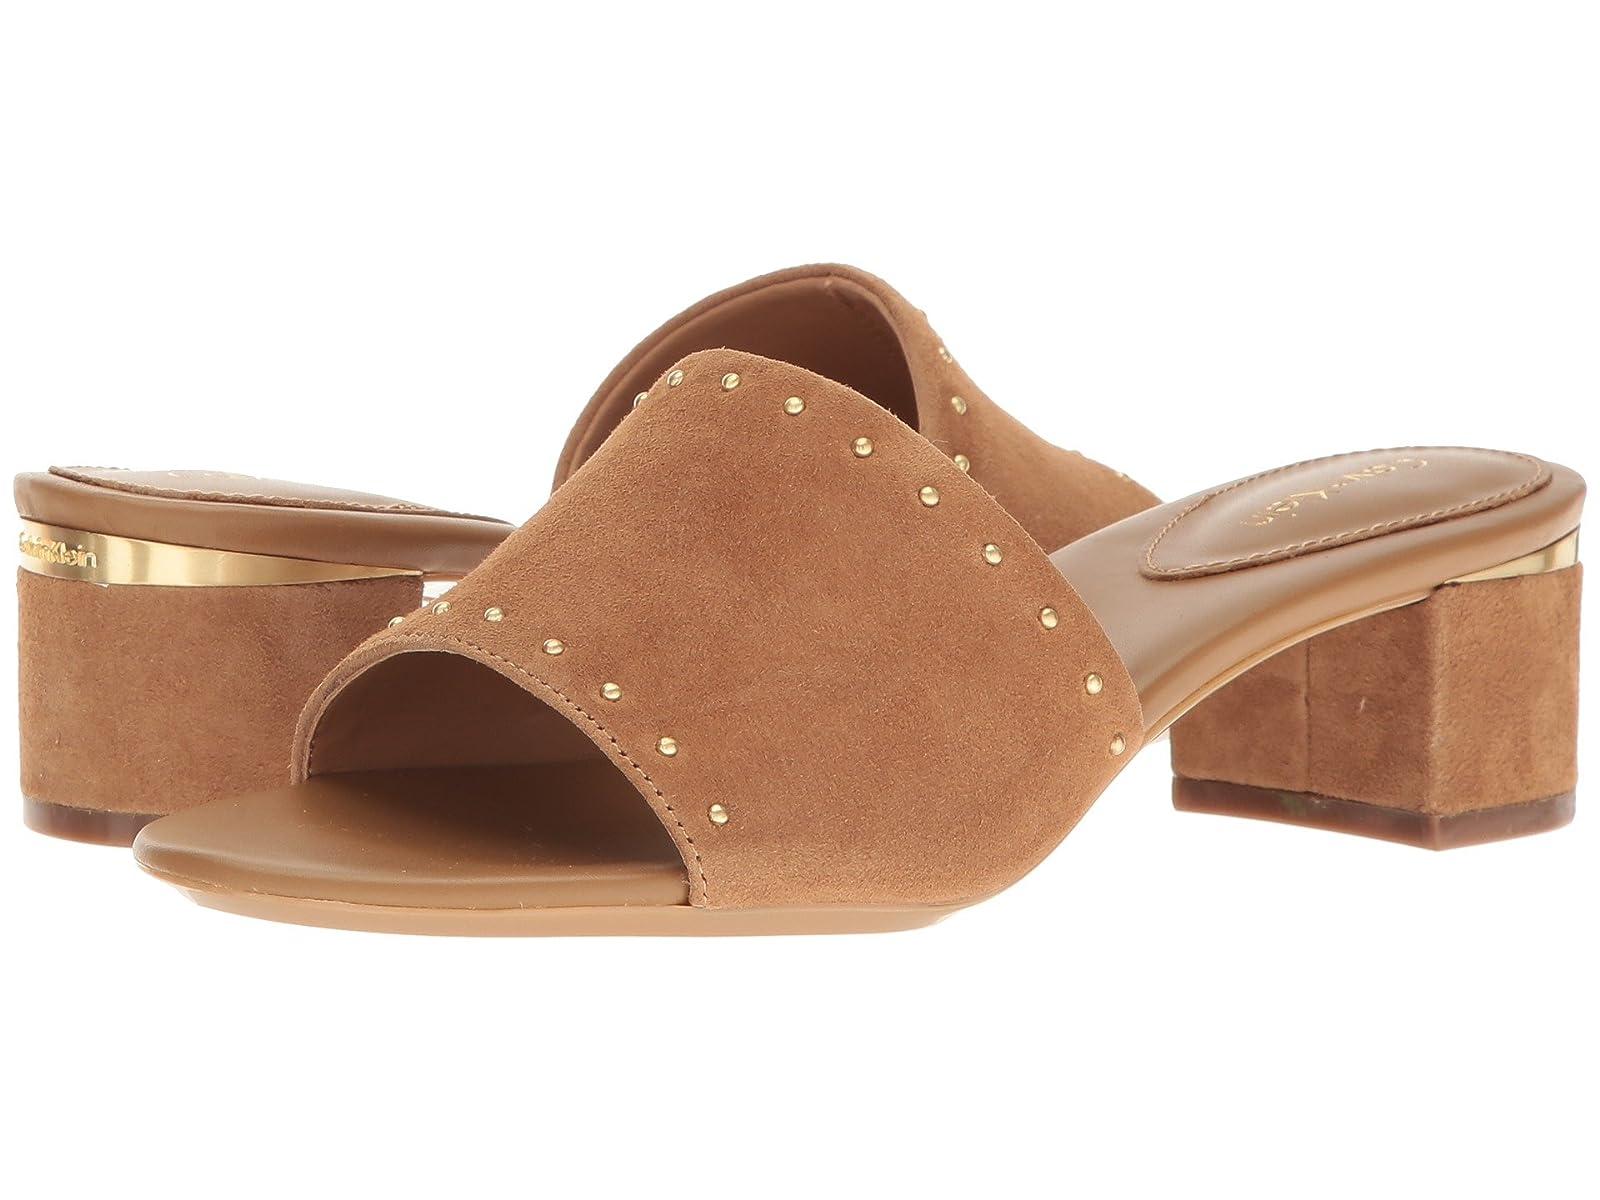 Calvin Klein DixieCheap and distinctive eye-catching shoes